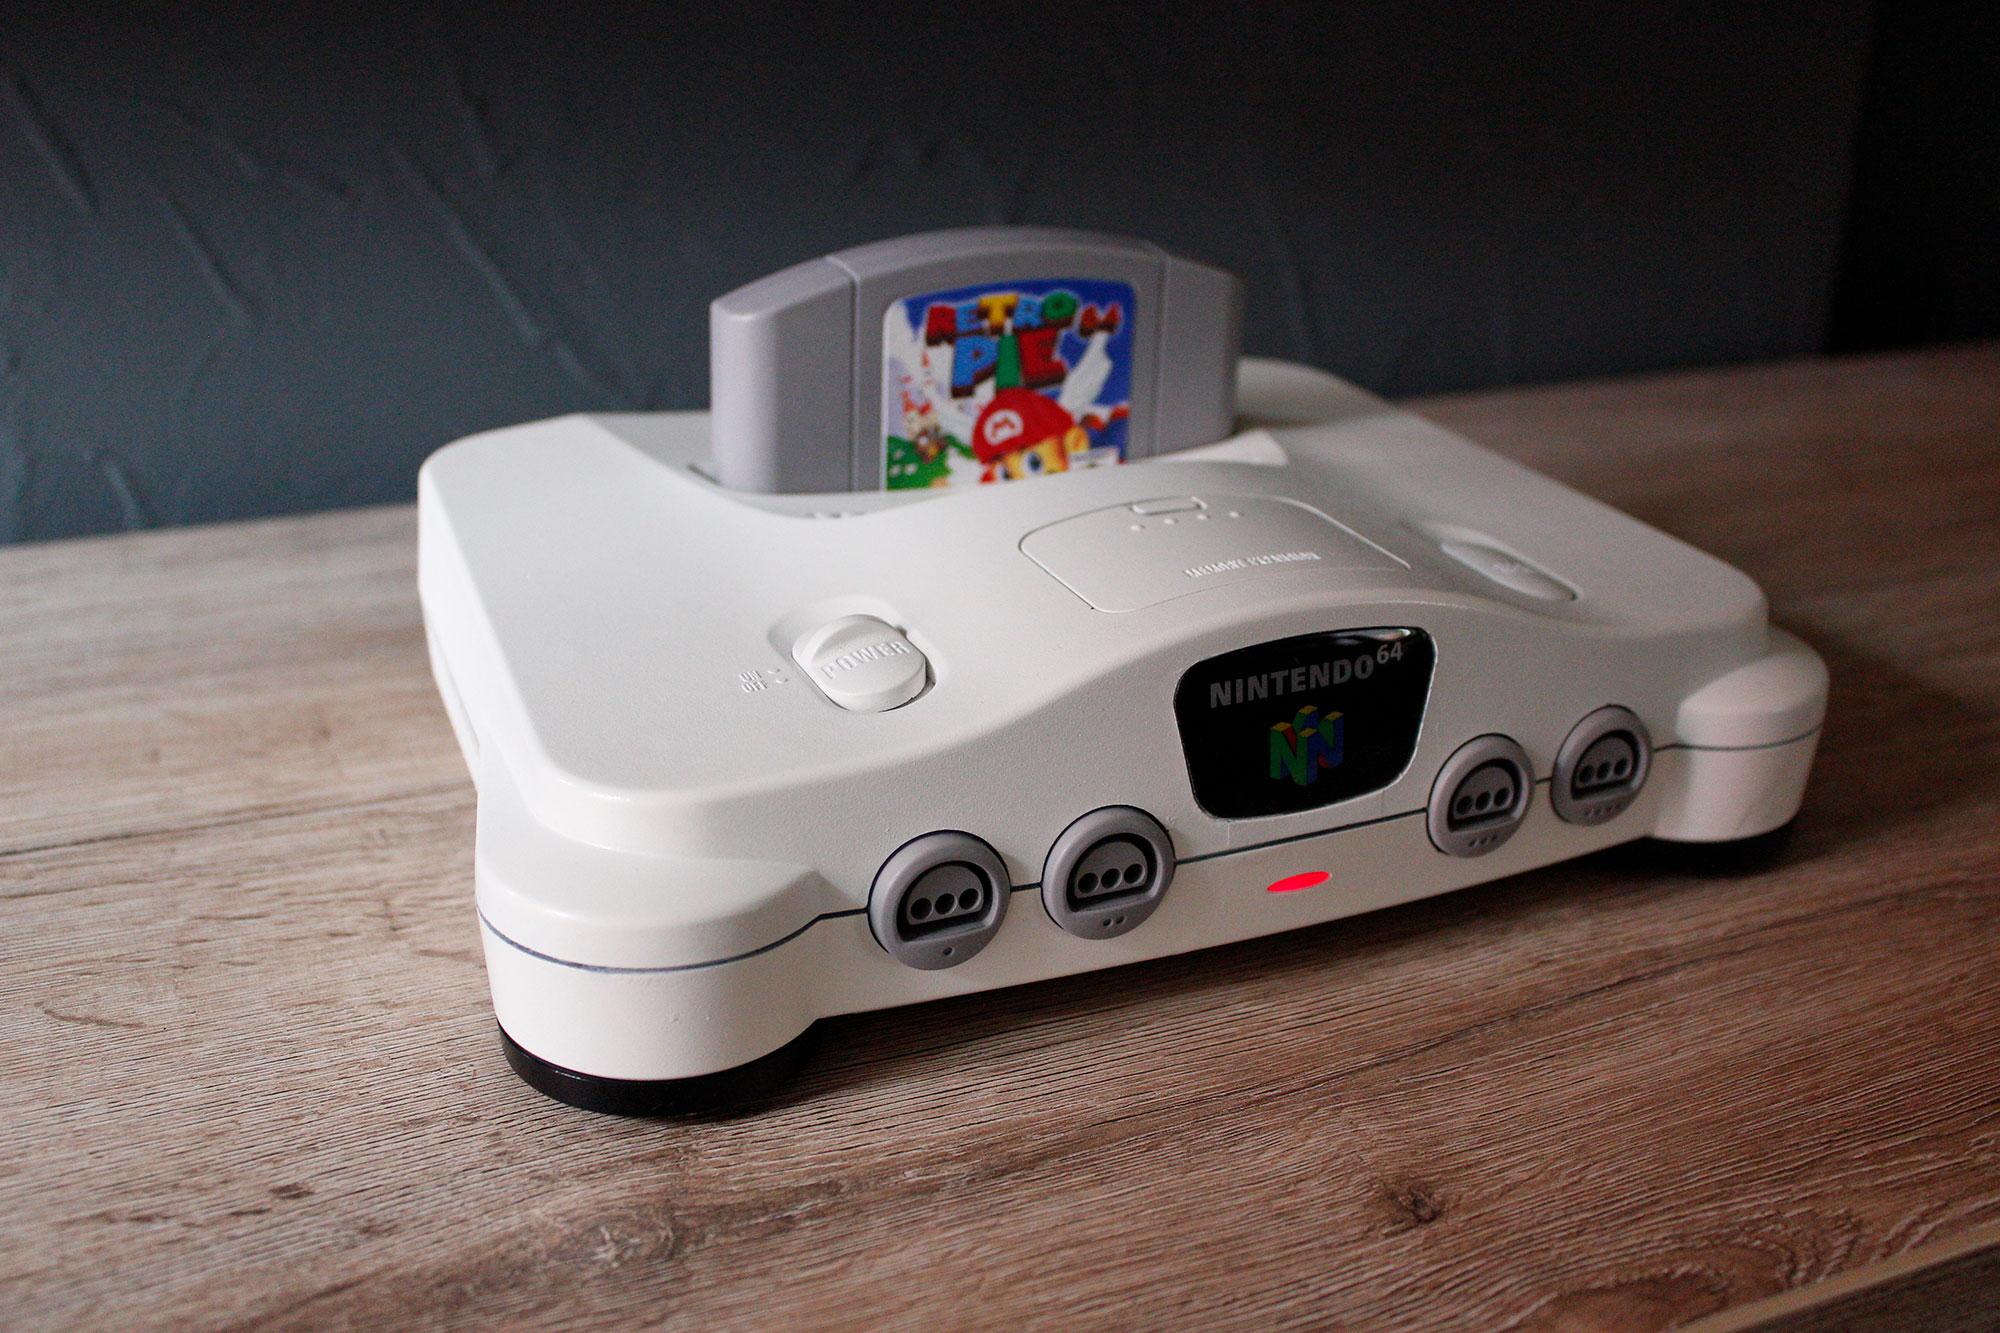 RetroPie64: My Nintendo 64 conversion - RetroPie Forum